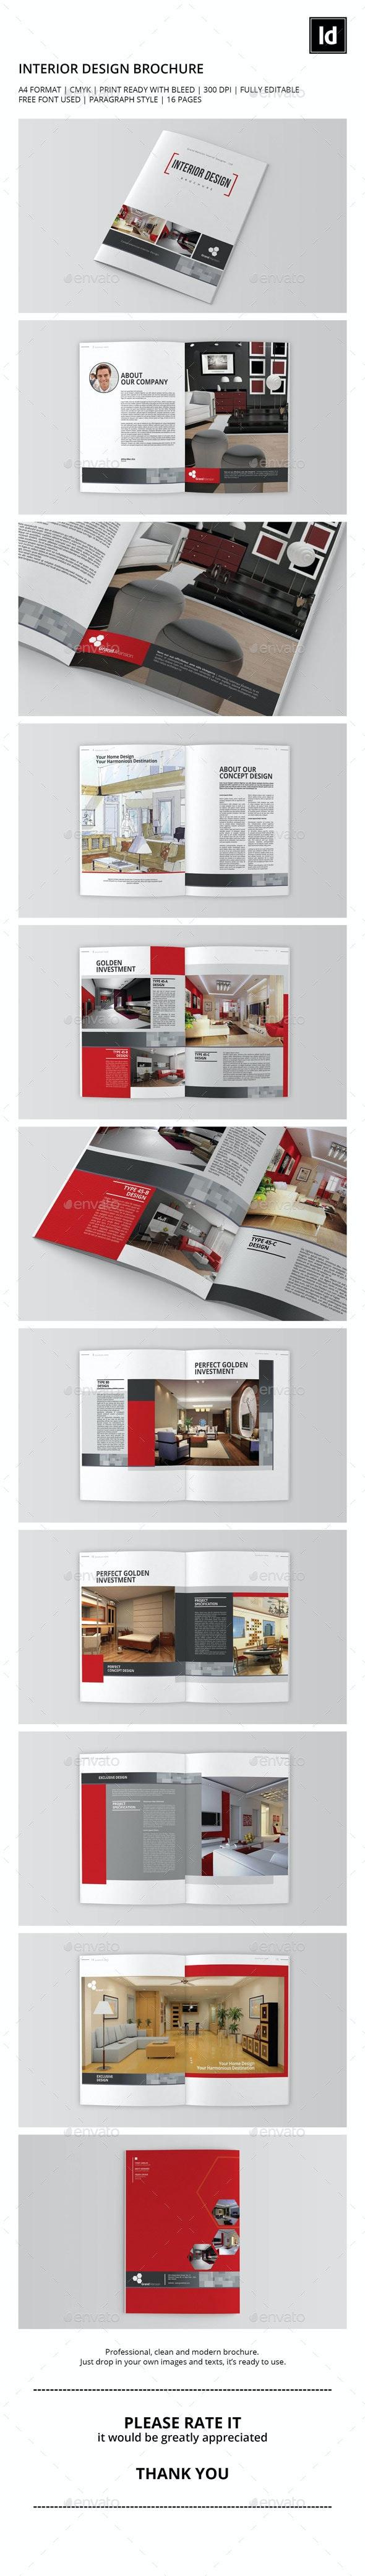 Interior Design Brochure/Catalog Vol.1 - Catalogs Brochures